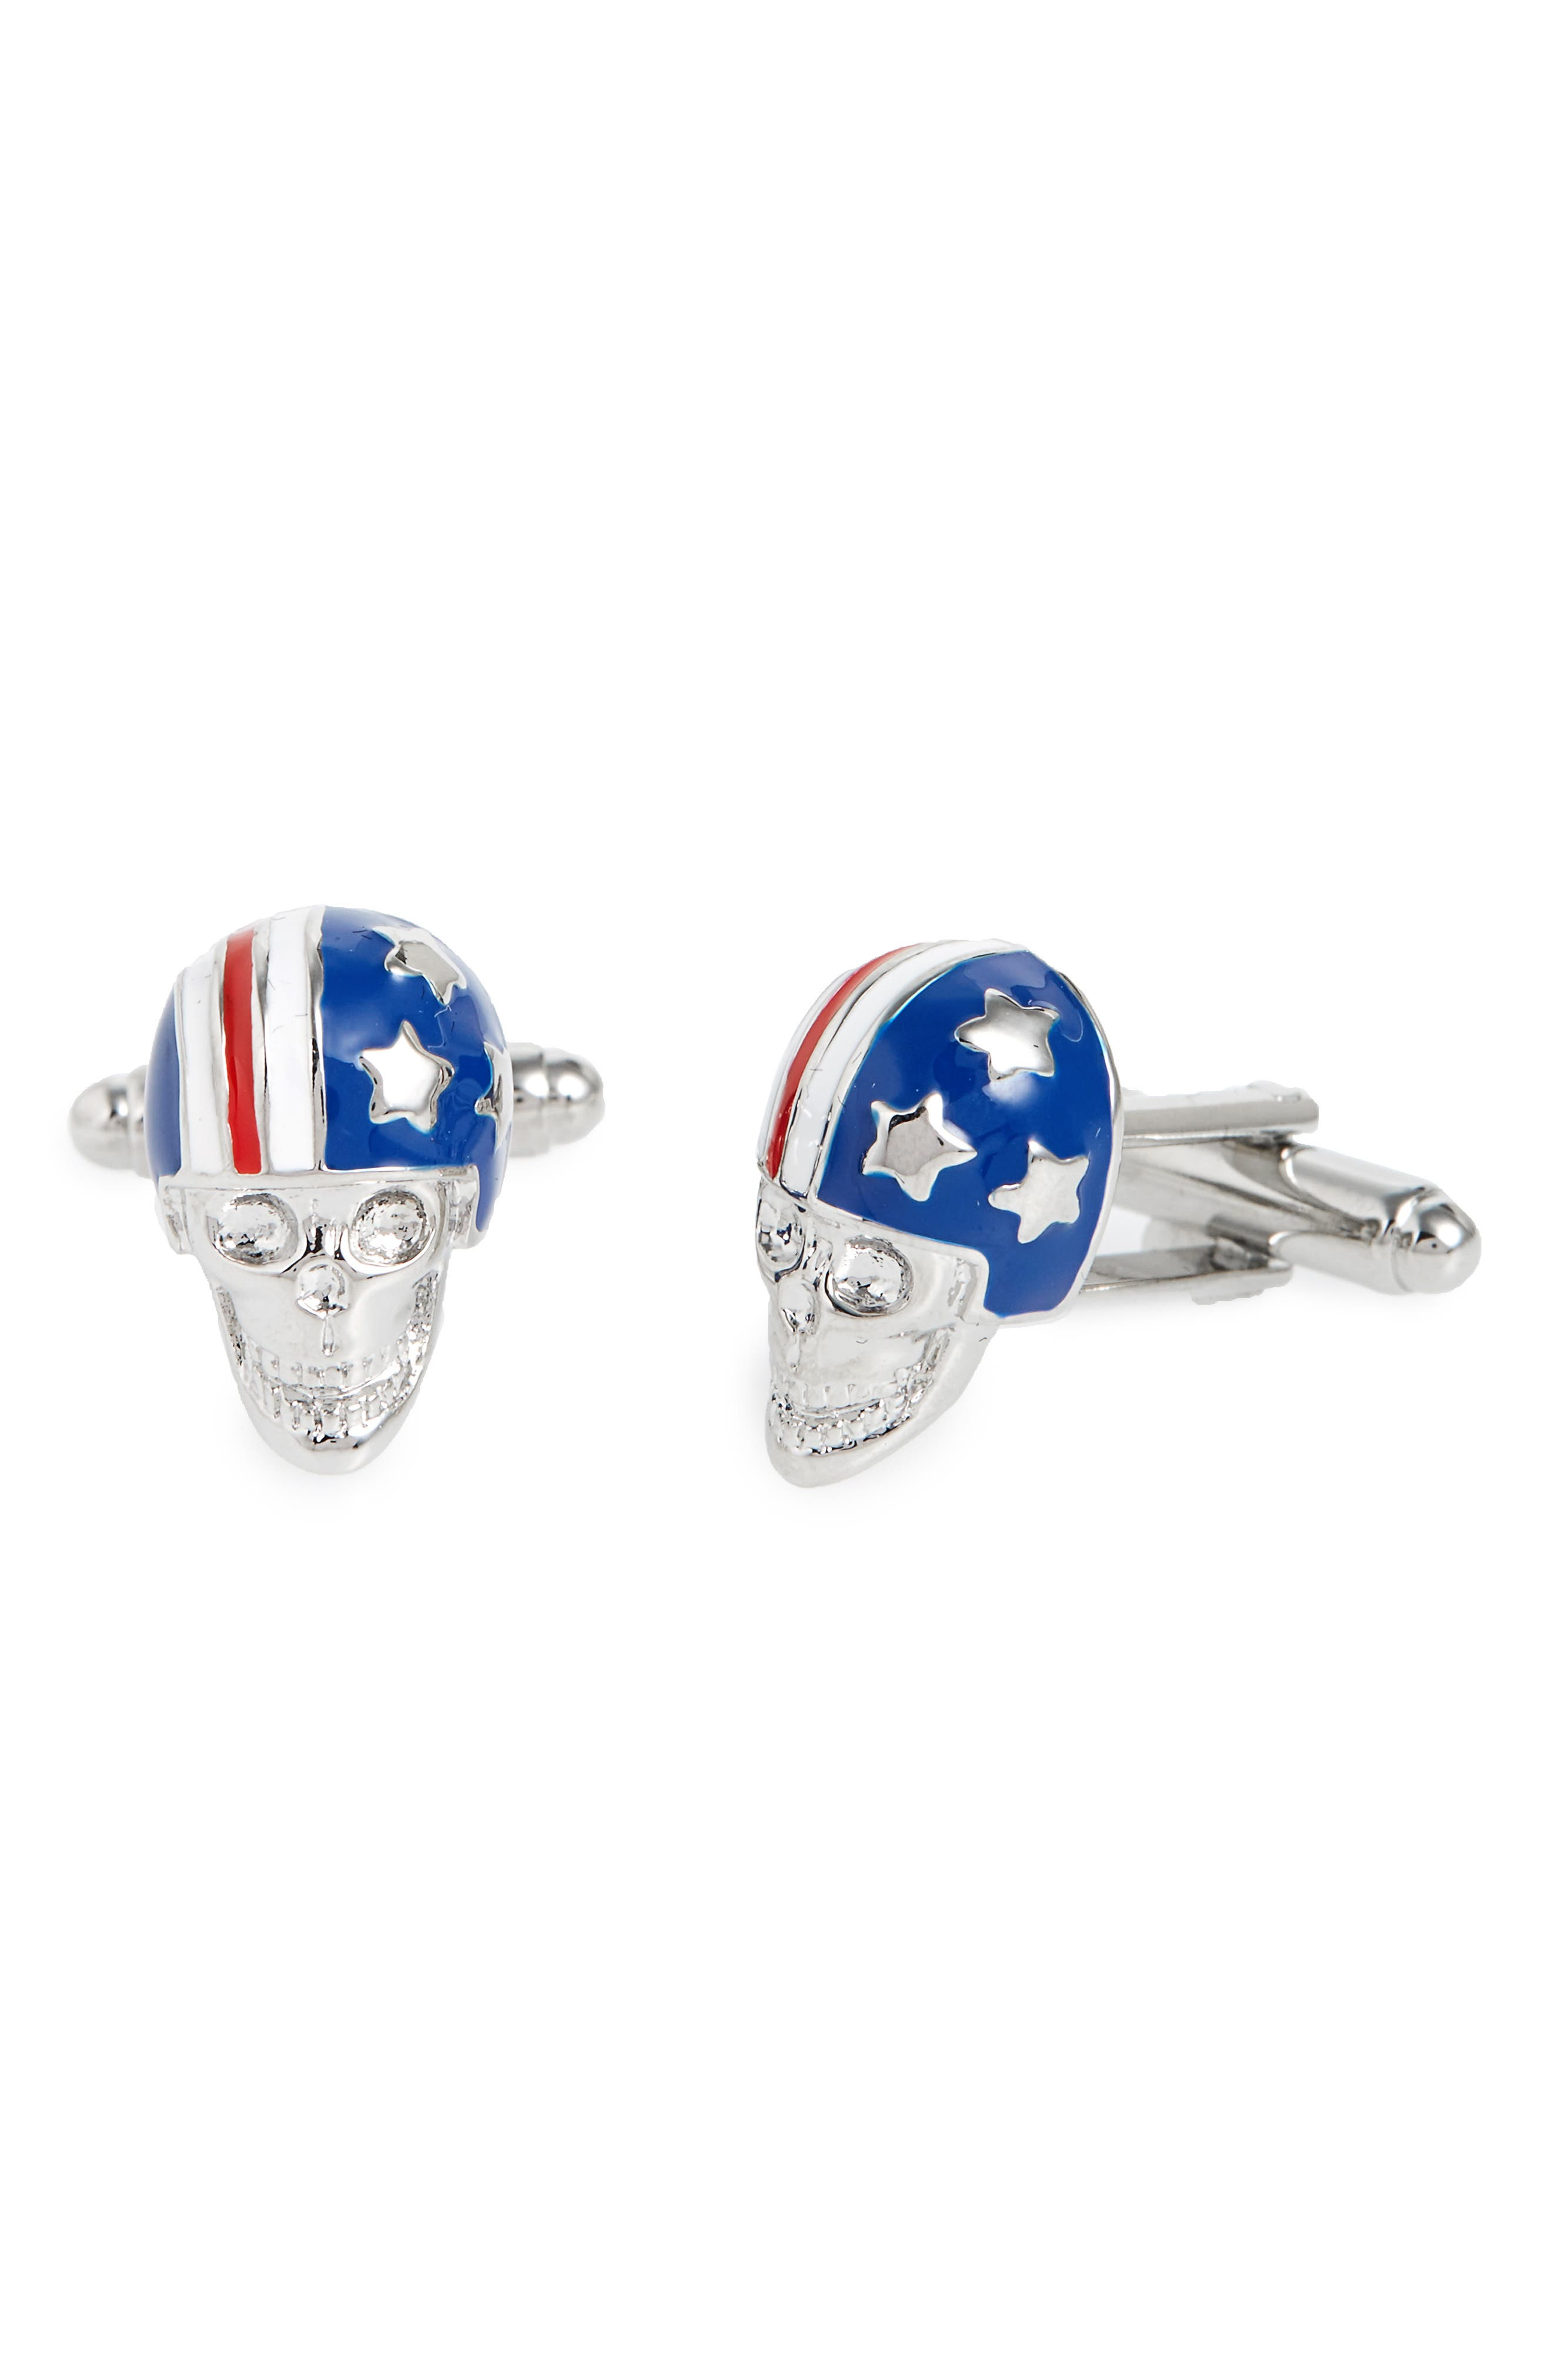 Flag Helmet Cuff Links,                         Main,                         color, Blue/ Silver